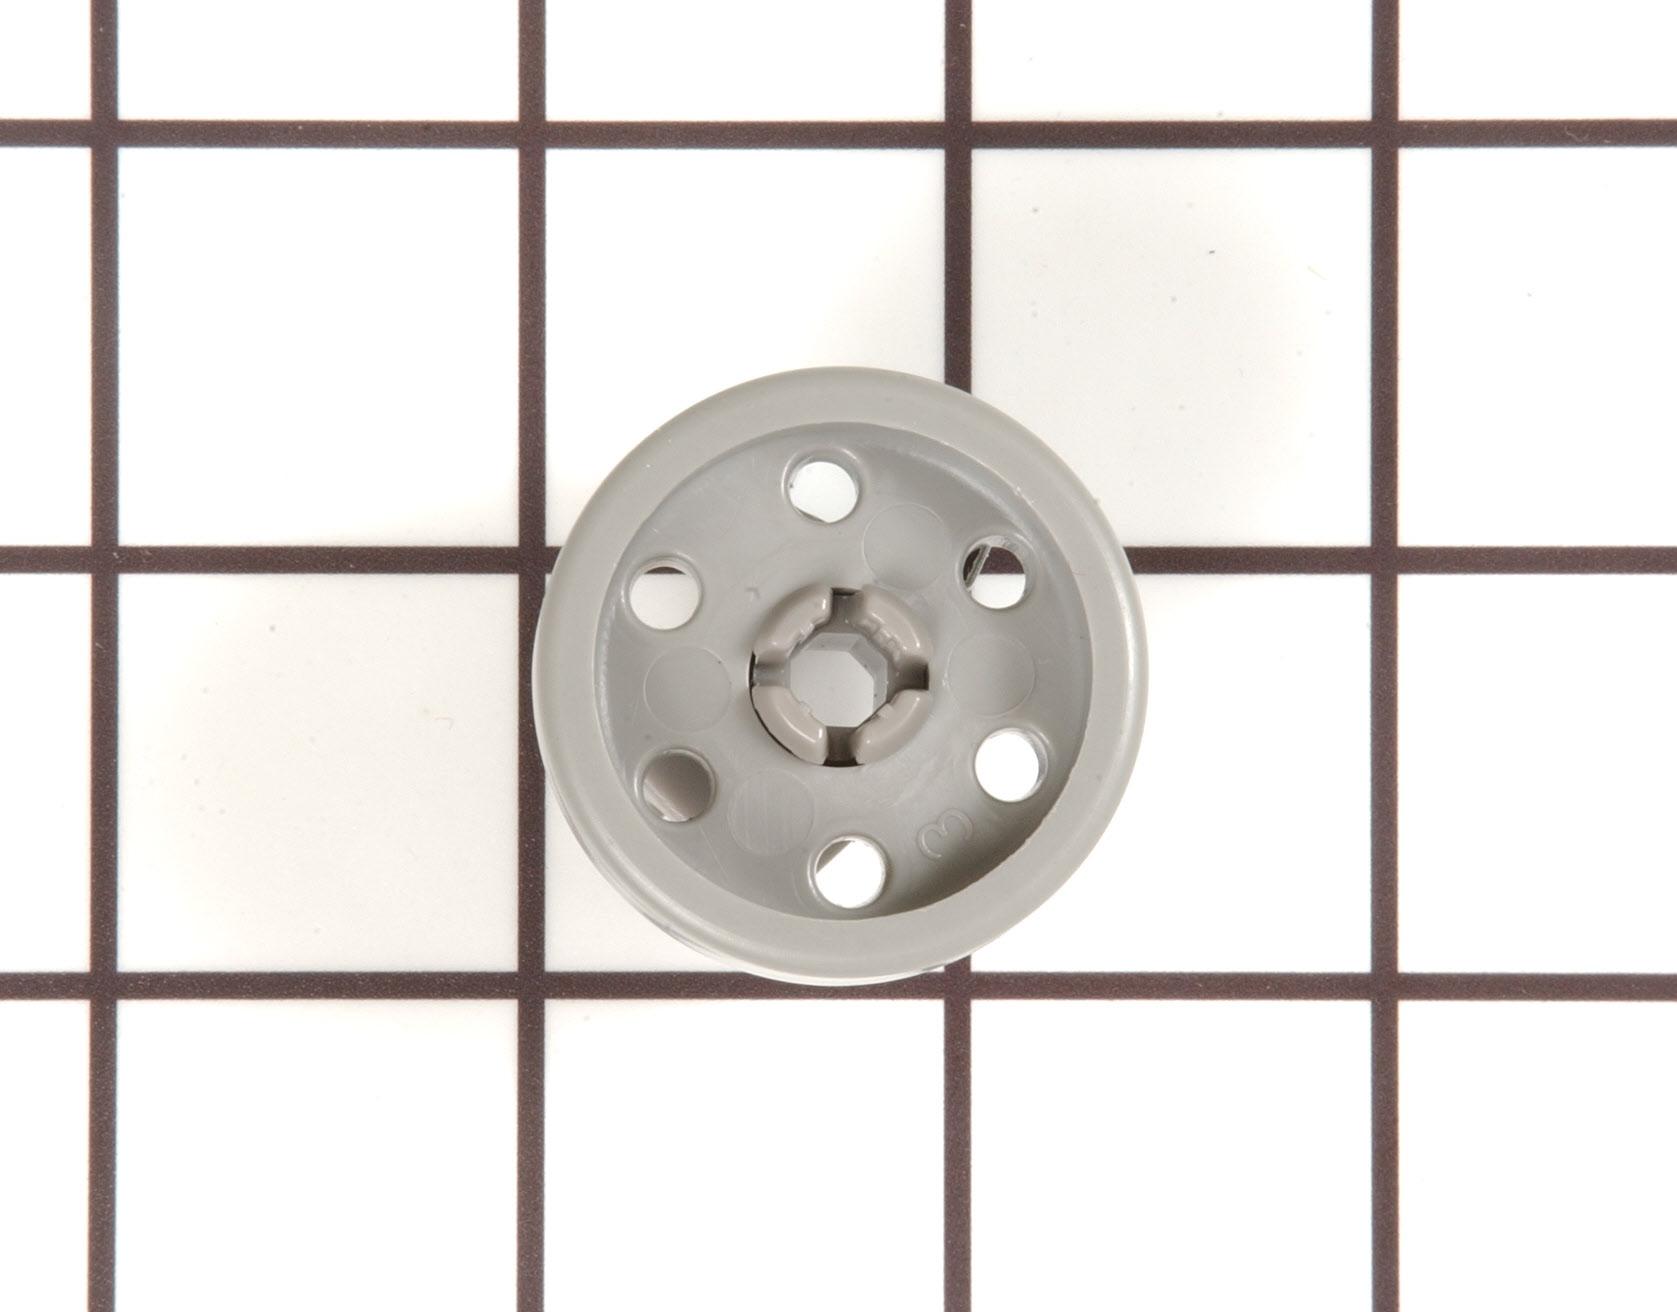 LG Dishwasher Part # 4581DD3003A - Dishrack Roller